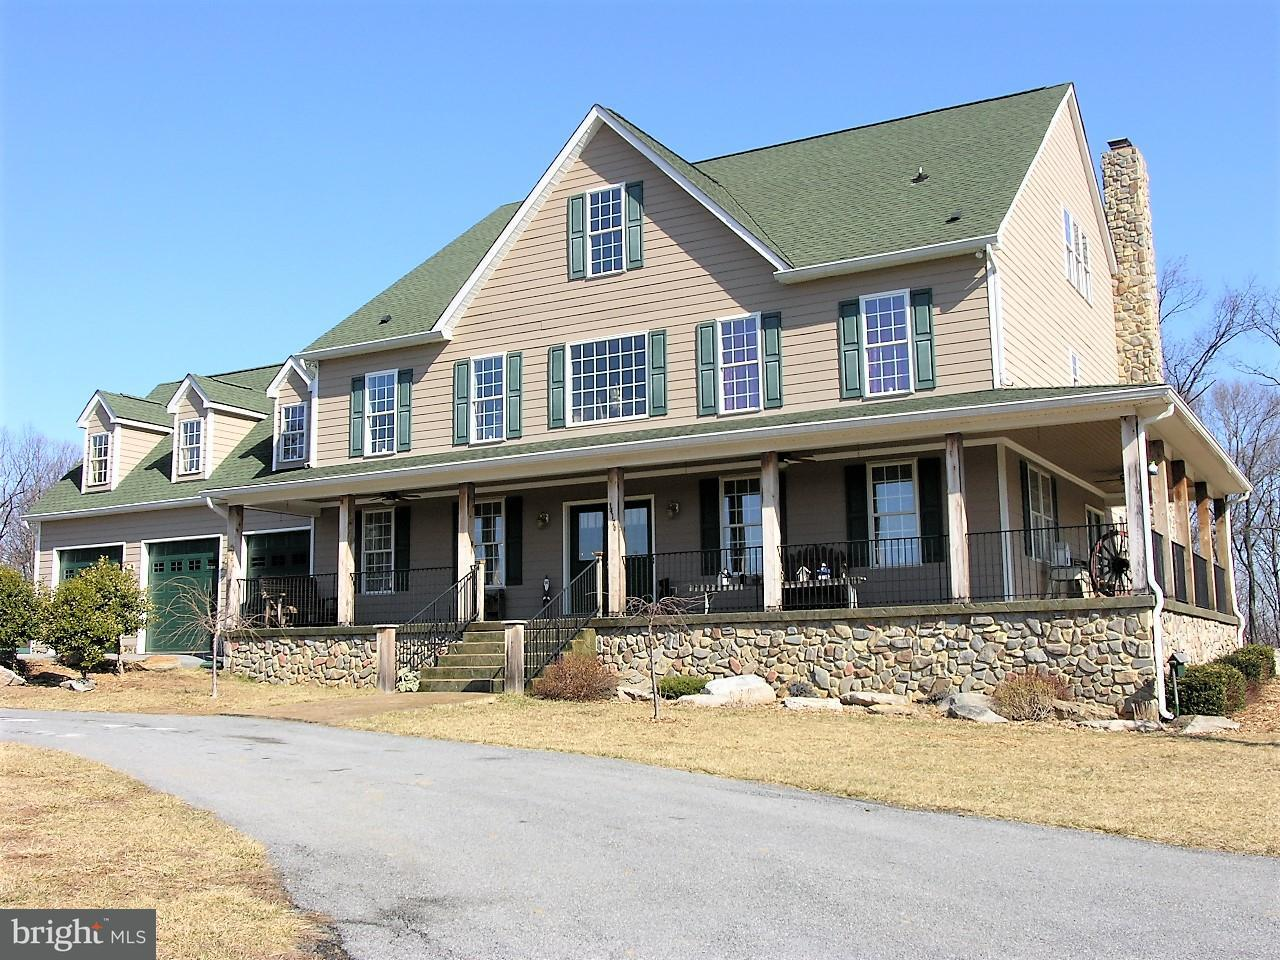 獨棟家庭住宅 為 出售 在 34176 Charles Town Pike 34176 Charles Town Pike Purcellville, 弗吉尼亞州 20132 美國